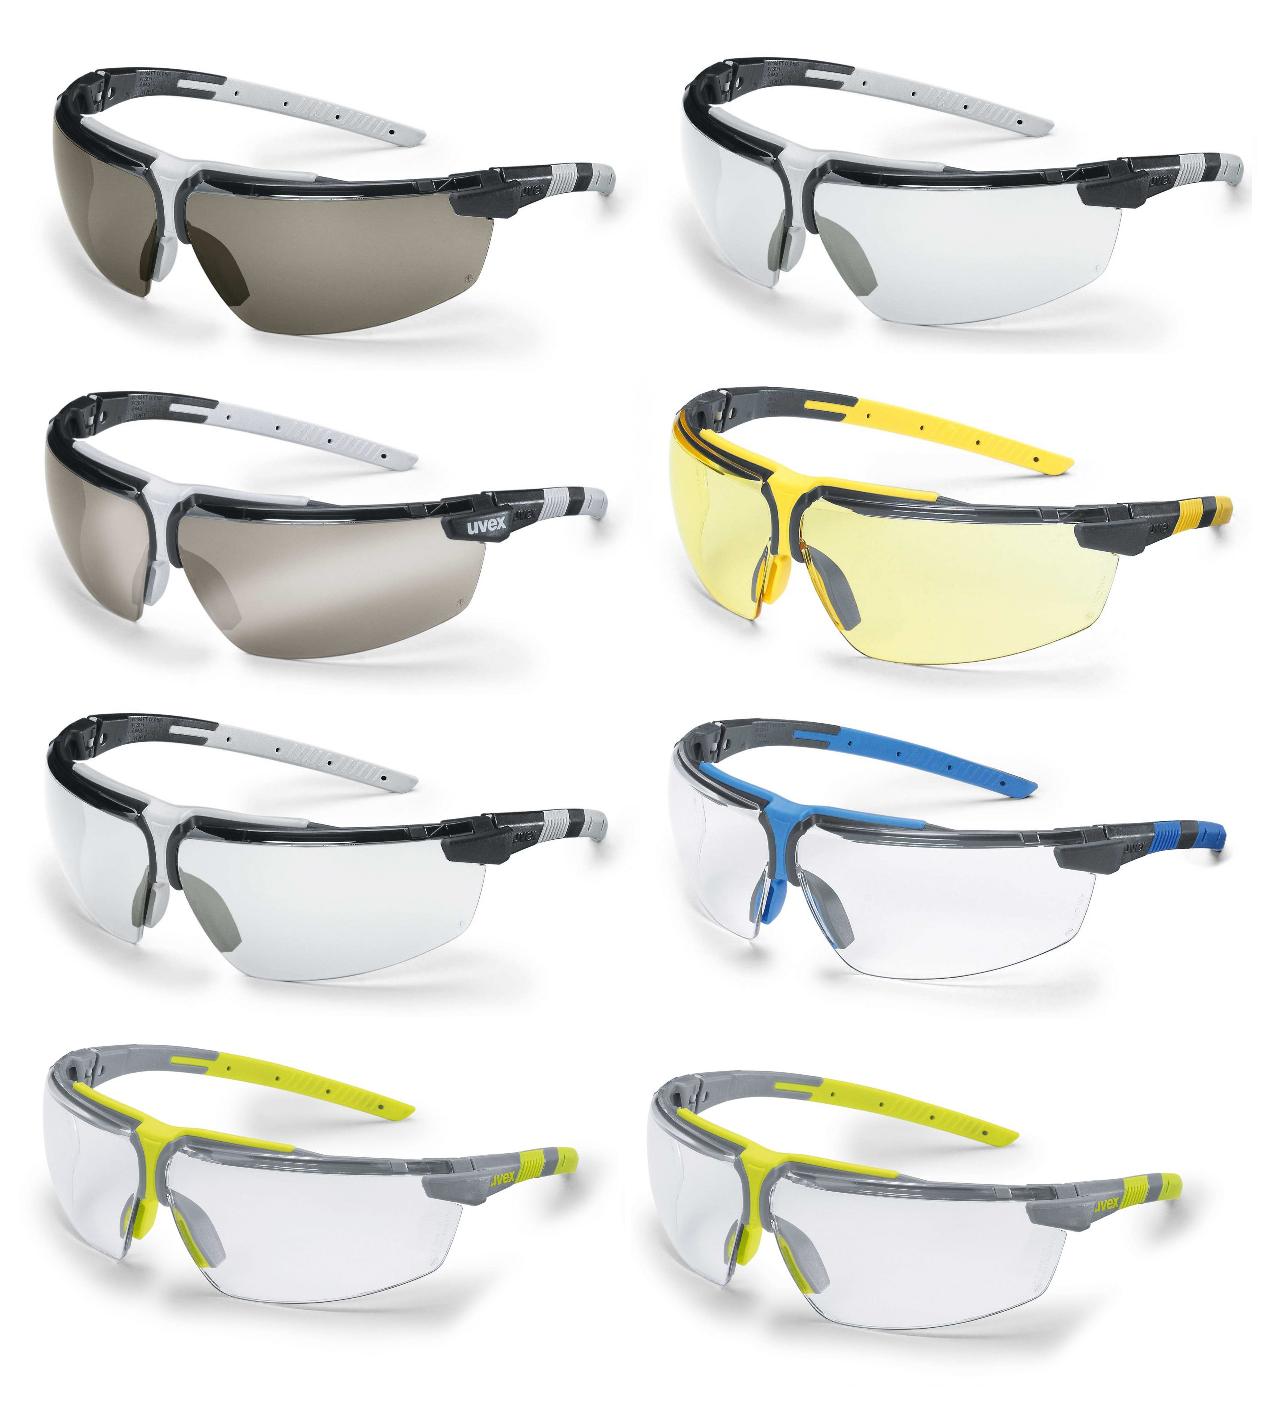 Spectacles Clear Lens UVEX I-VO 9160065 Safety Glasses Blue Brown Frame